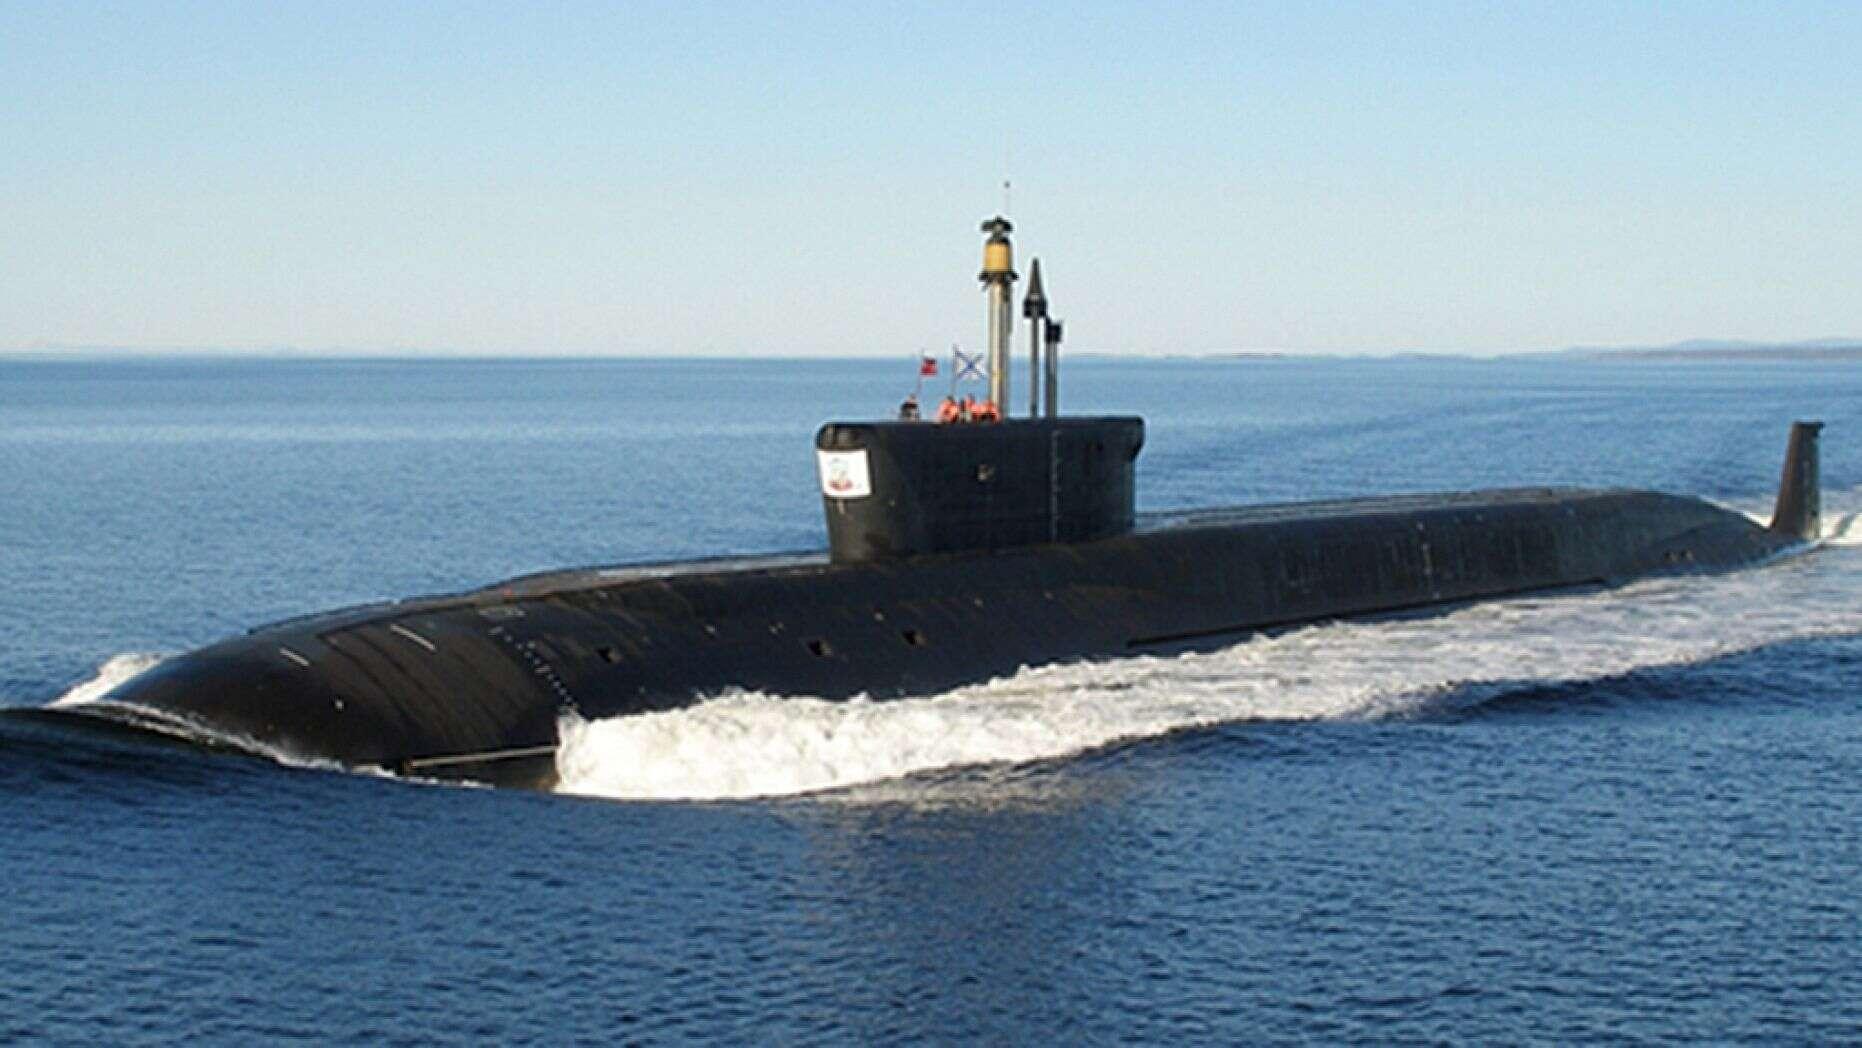 russiannuclearsubsuccessfullytestlaunchesintercontinentalballisticmissilegovernmentclaims